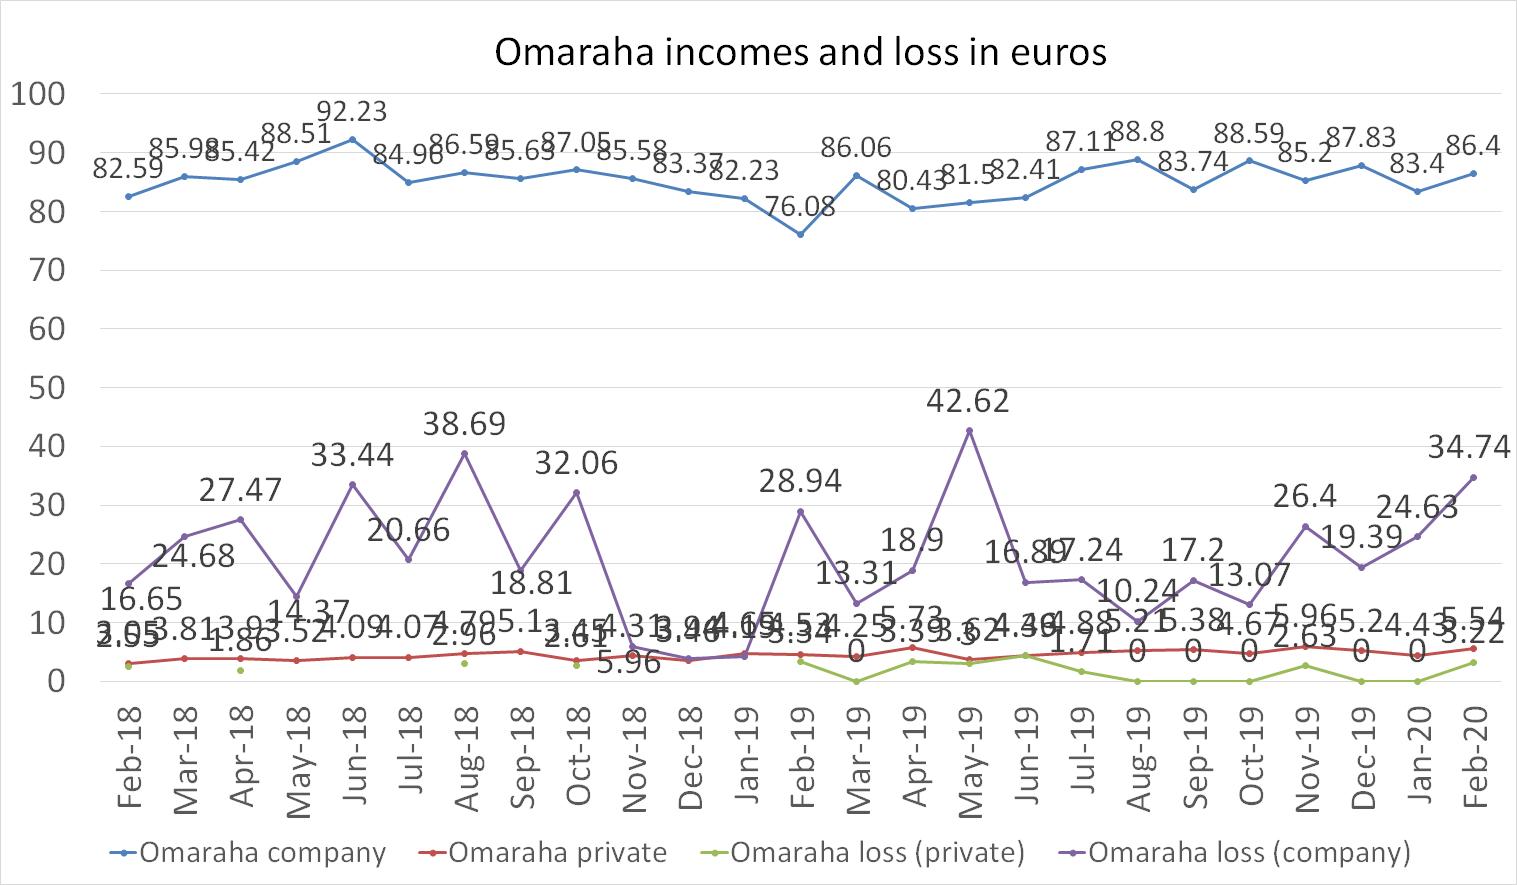 Omaraha incomes and loss in euros february 2020